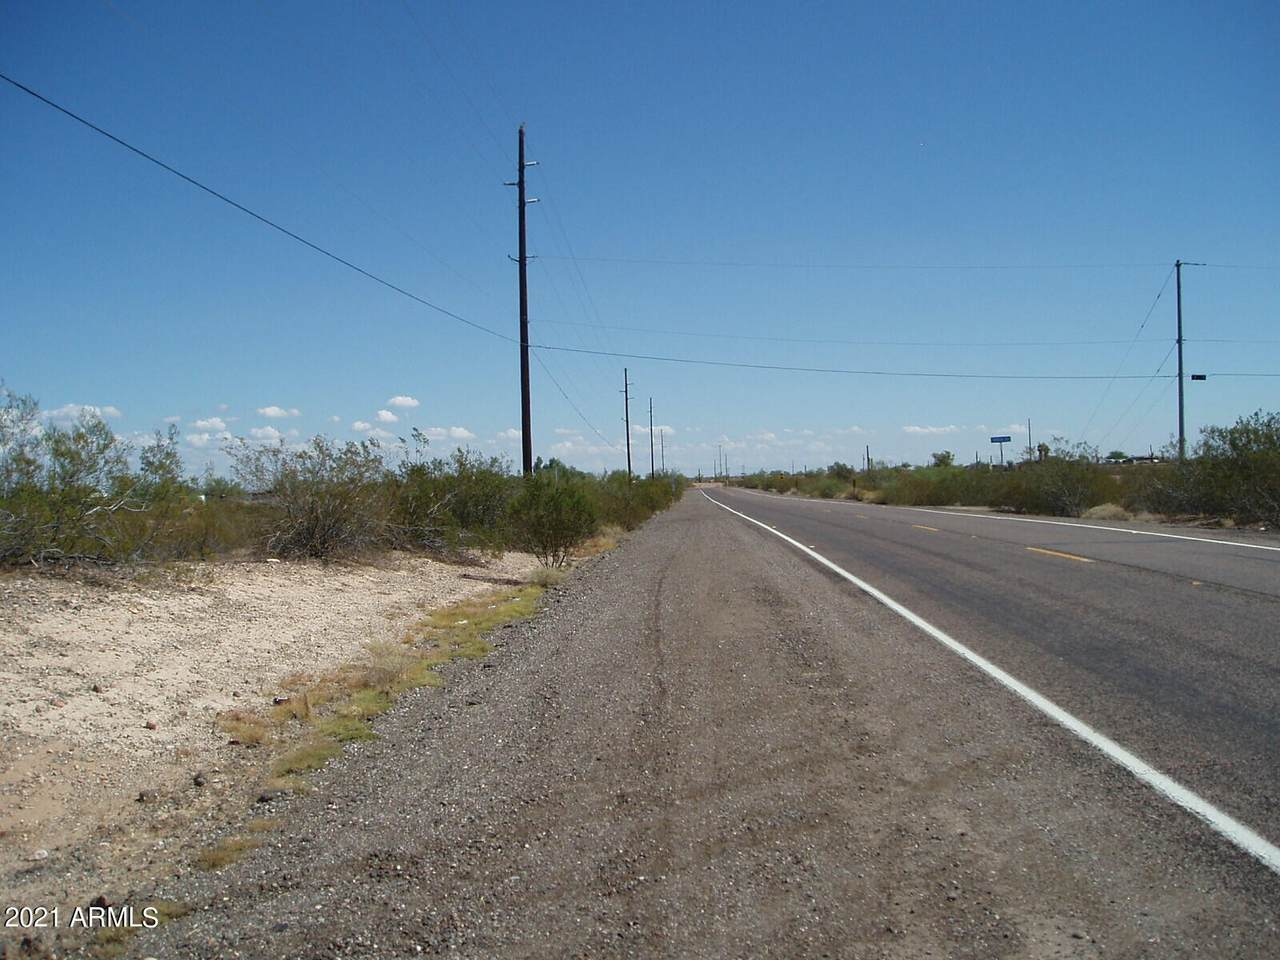 30080 Peak View Road - Photo 1